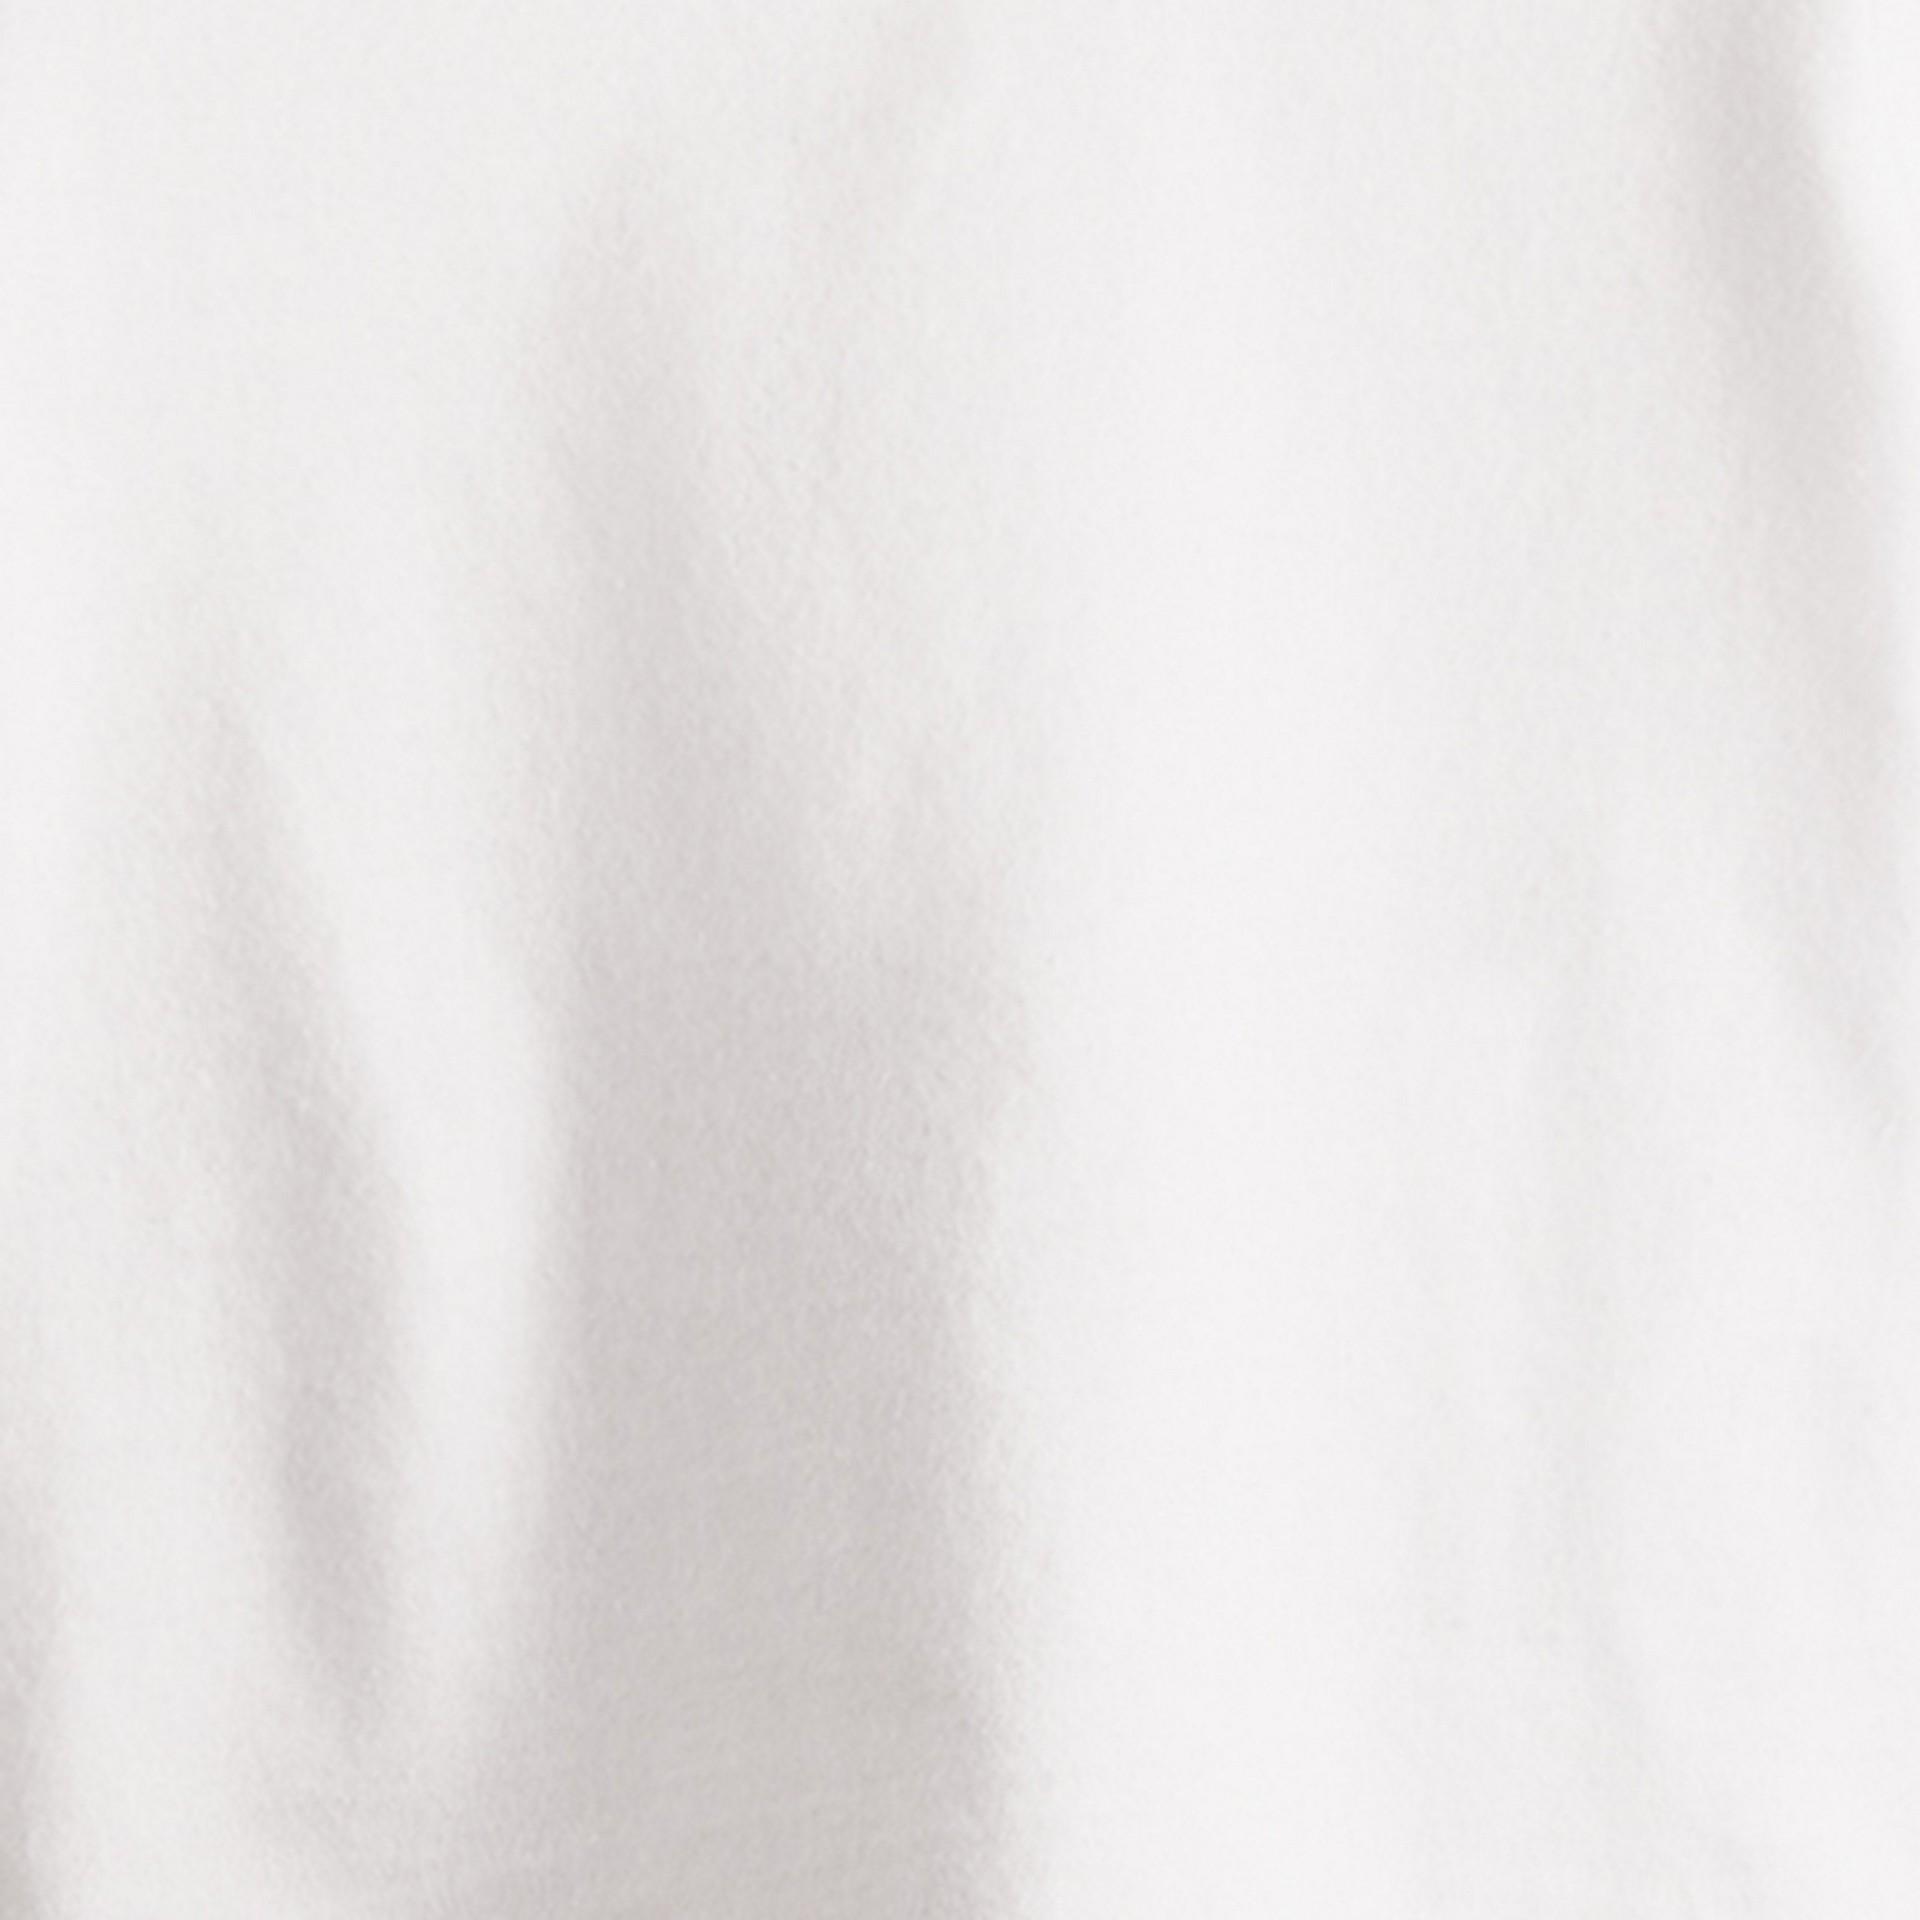 White Check Cuff Cotton T-Shirt - gallery image 2